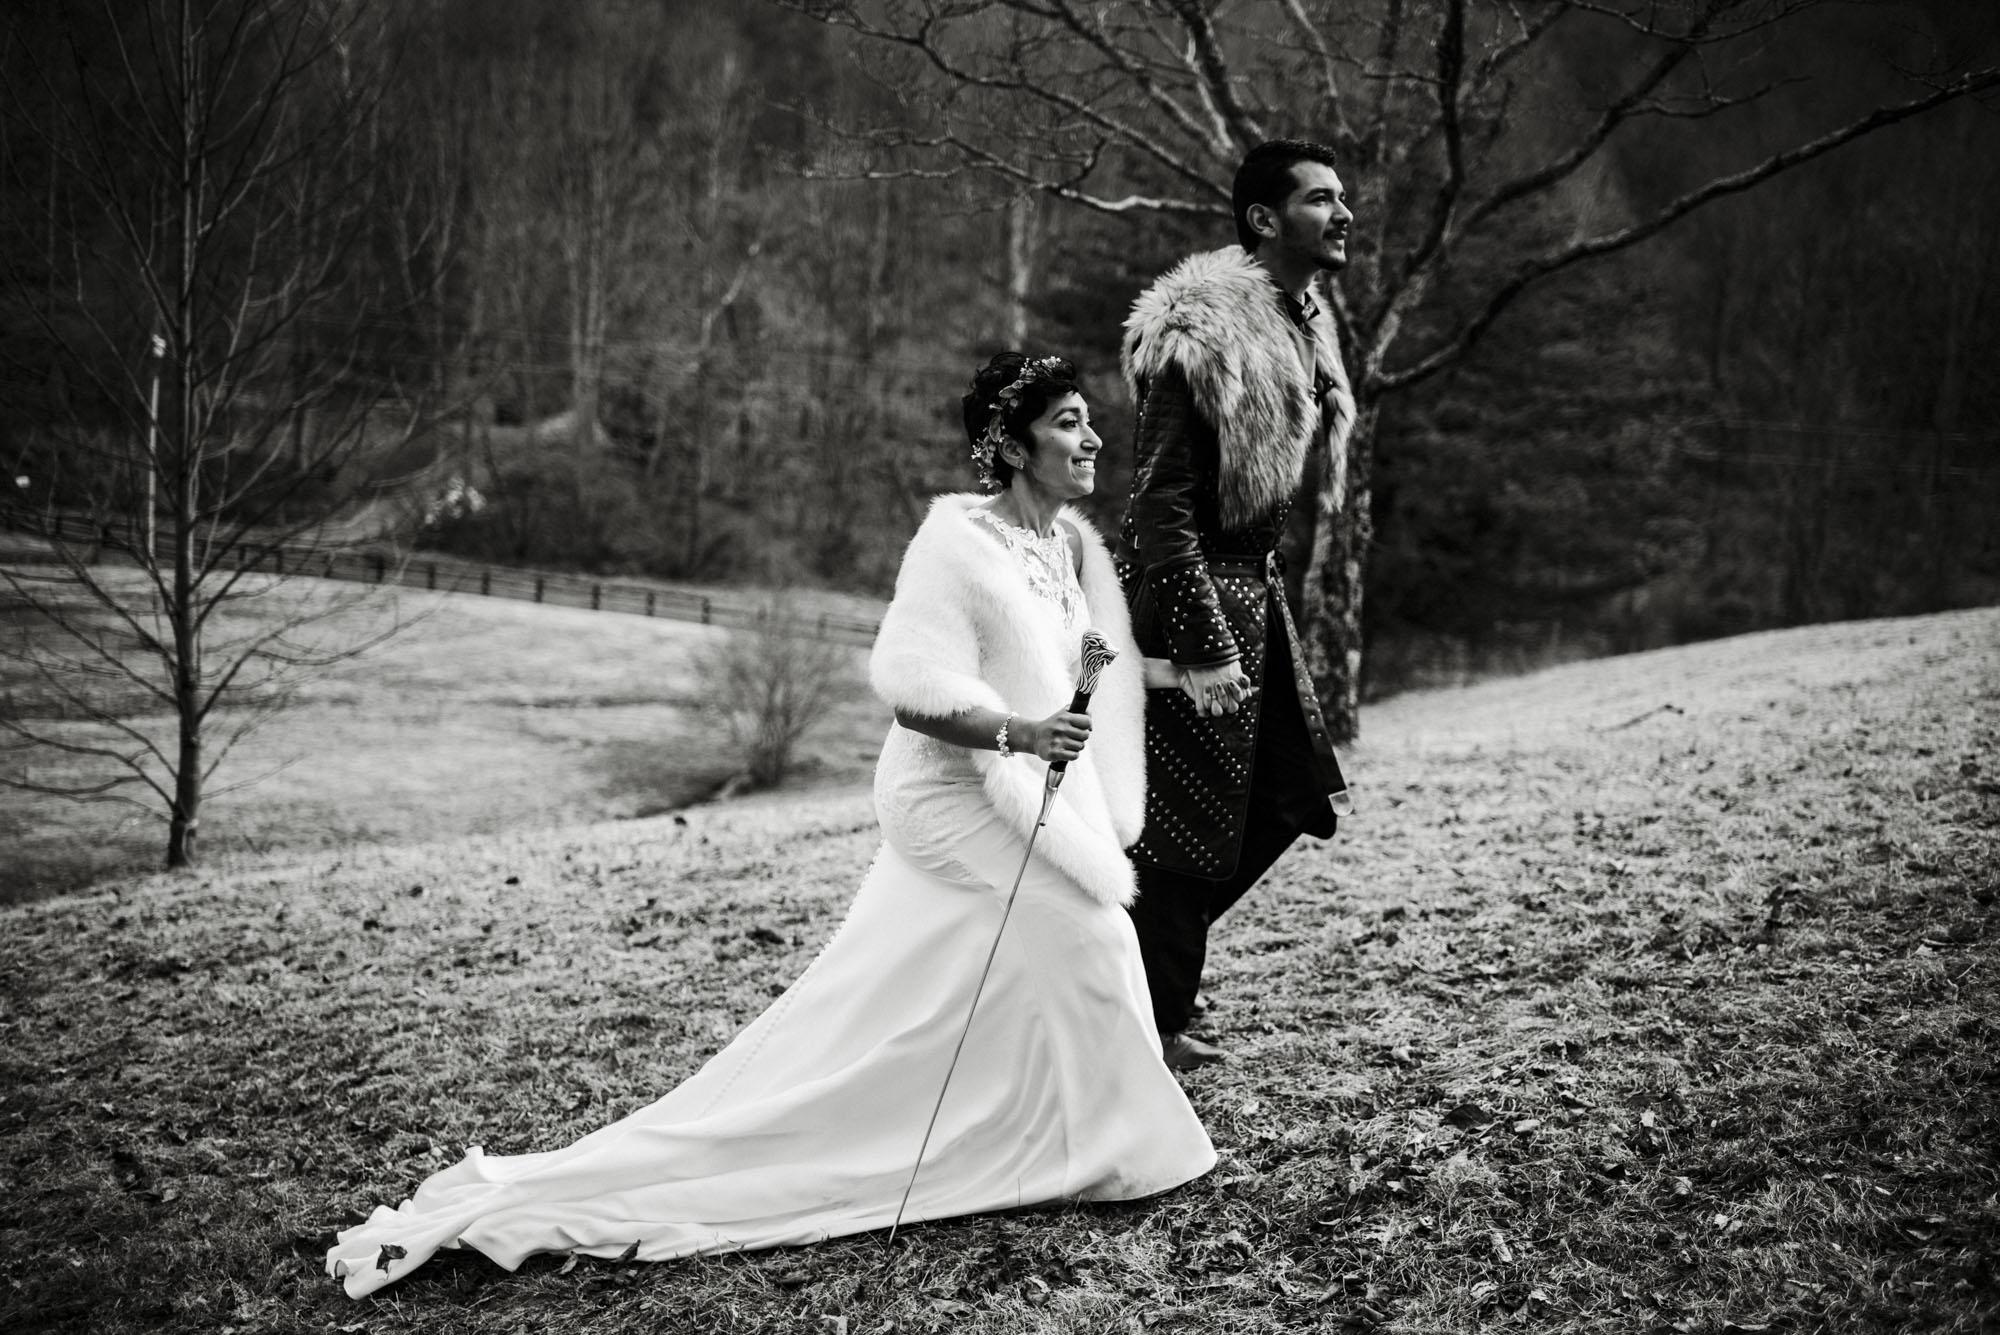 Game of Thrones Elopement - Winter Elopement - Shenandoah National Park Elopement Photographer - Virginia Adventure Photographer - Blue Ridge Parkway Elopement Photographer_52.jpg